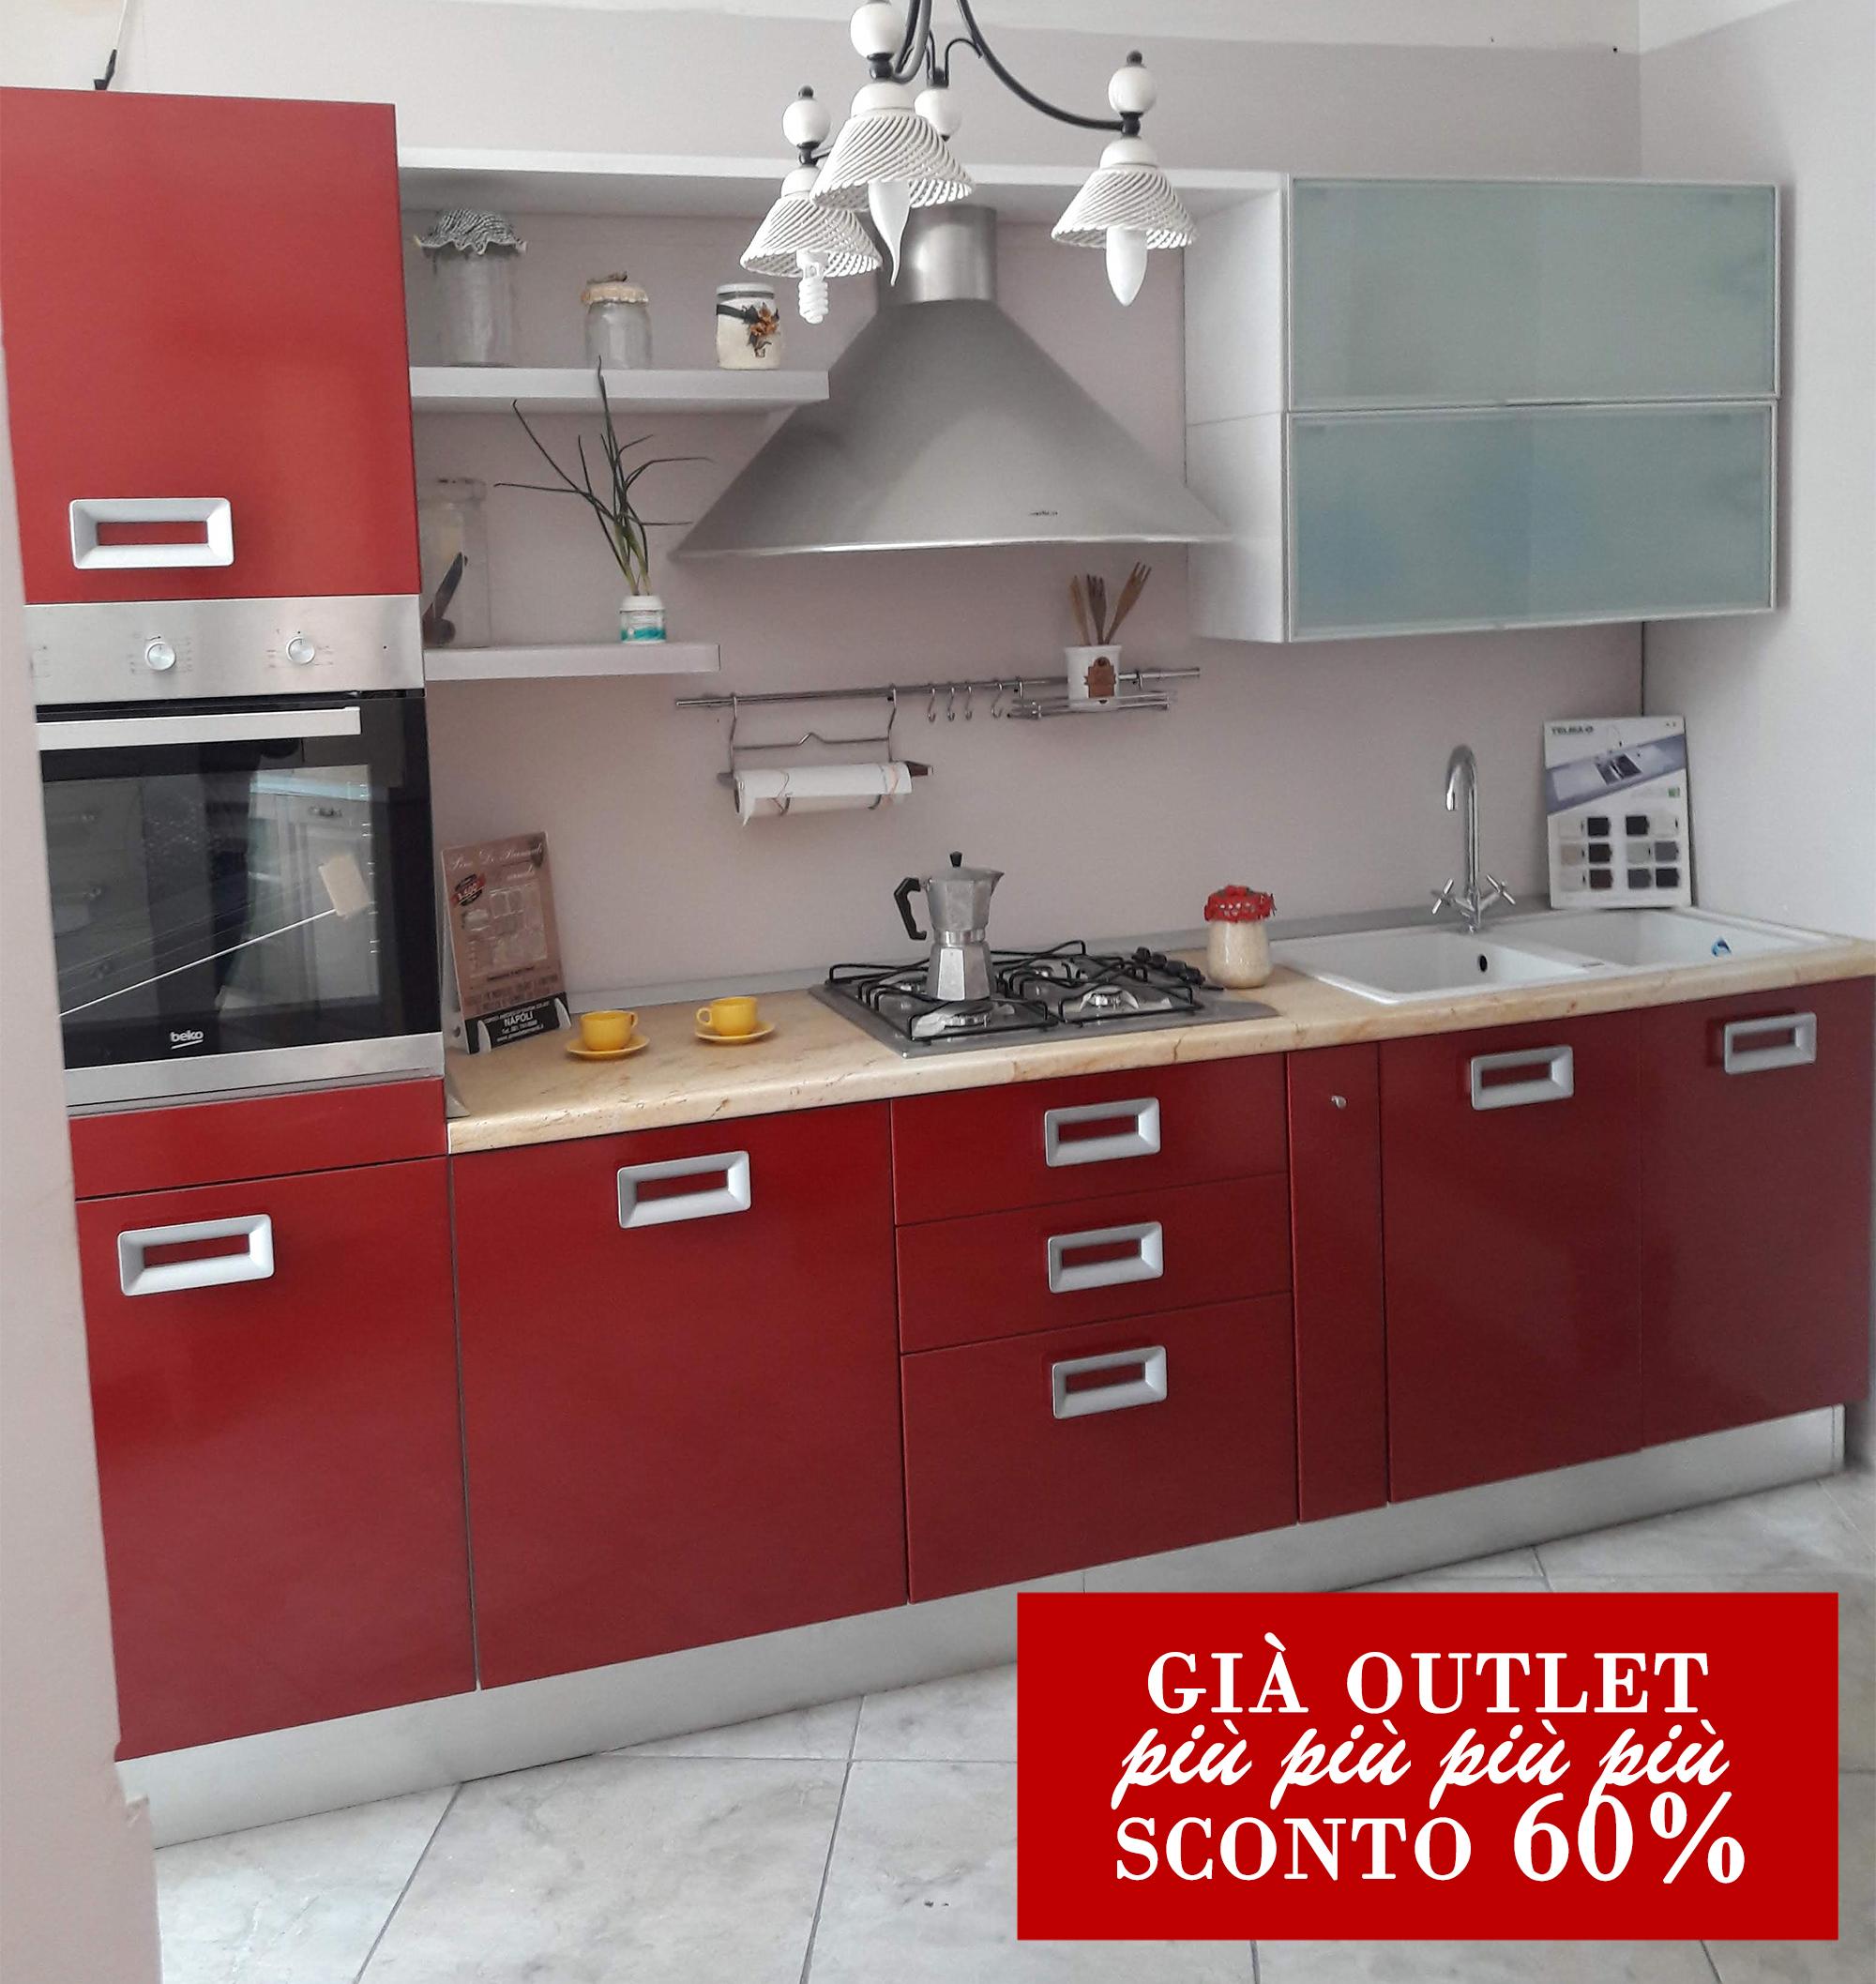 SCONTO -60% CUCINE MODERNE | iNobili Casa - Cucine su misura ...